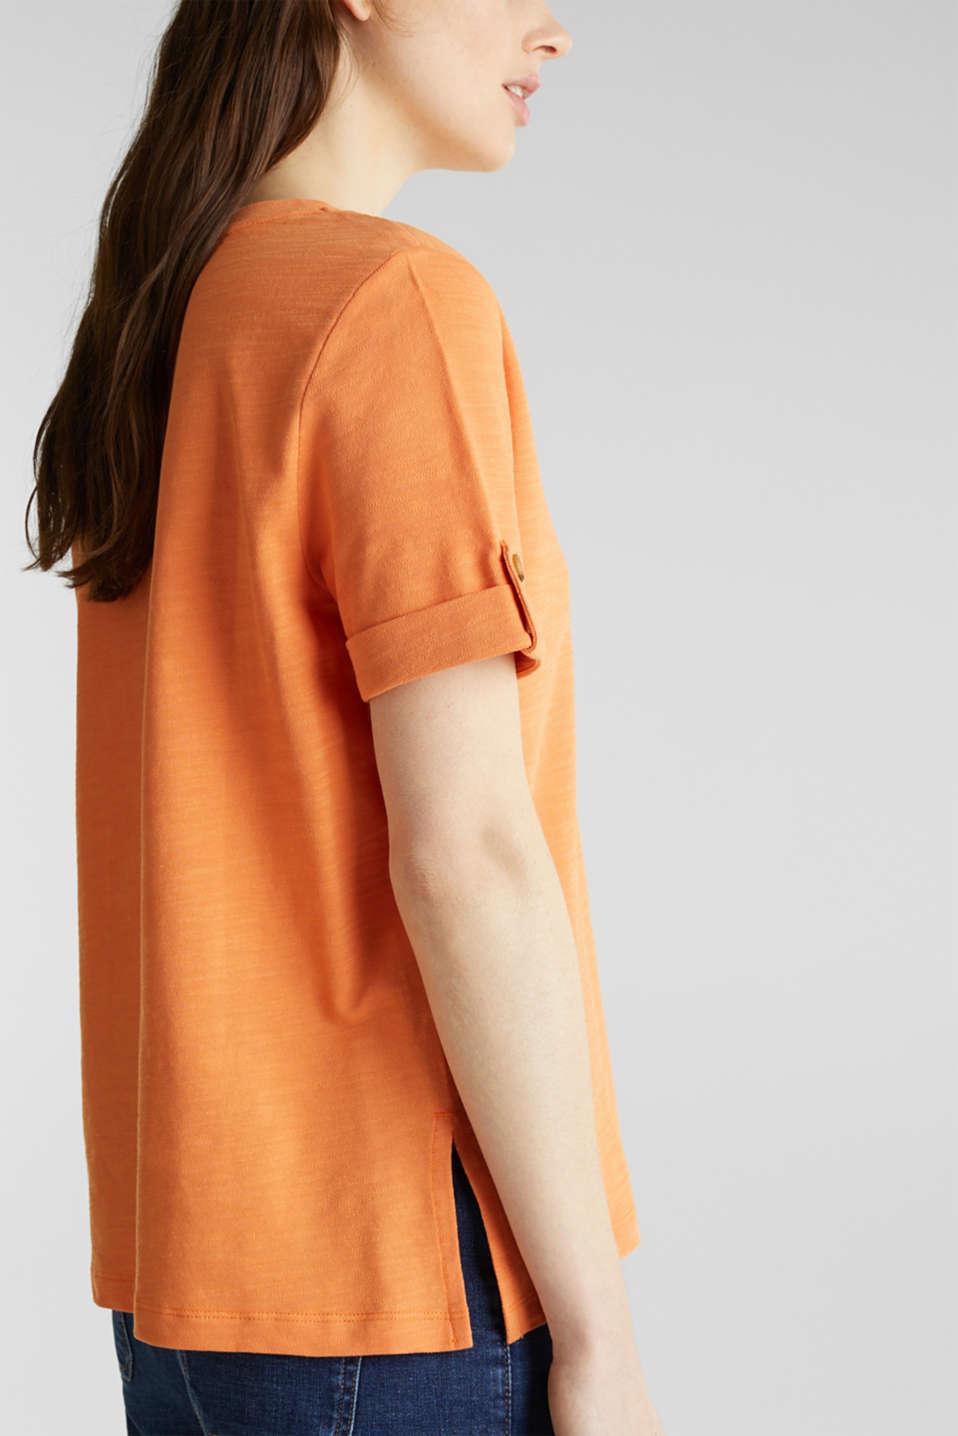 Piqué-Shirt aus 100% Baumwolle, RUST ORANGE, detail image number 5